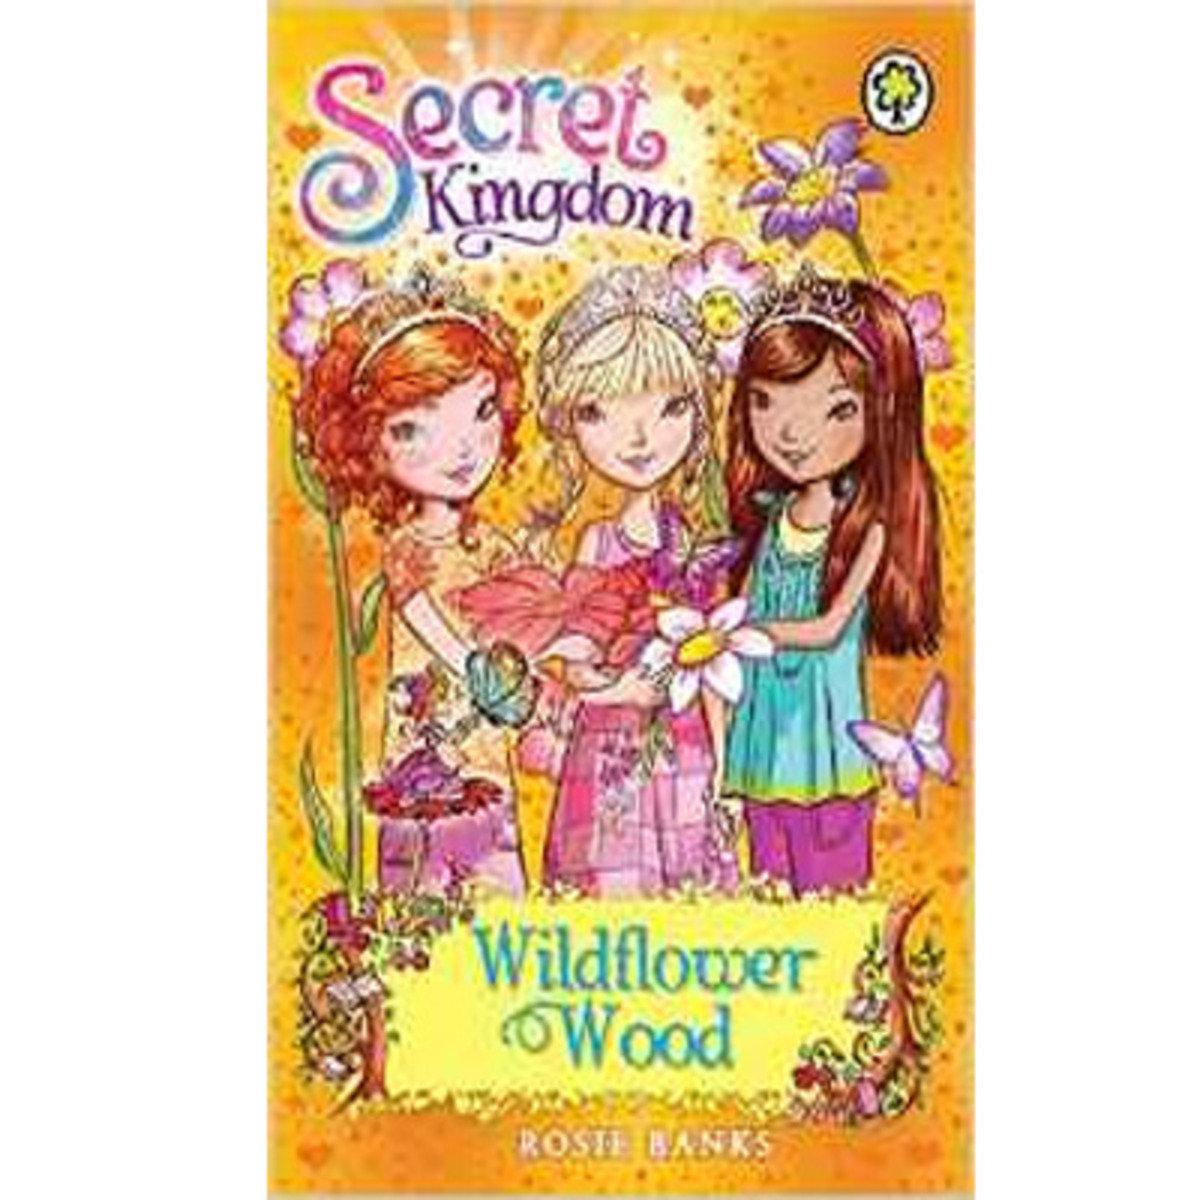 SECRET KINGDOM #13 WILDFLOWER WOOD 9781408323380